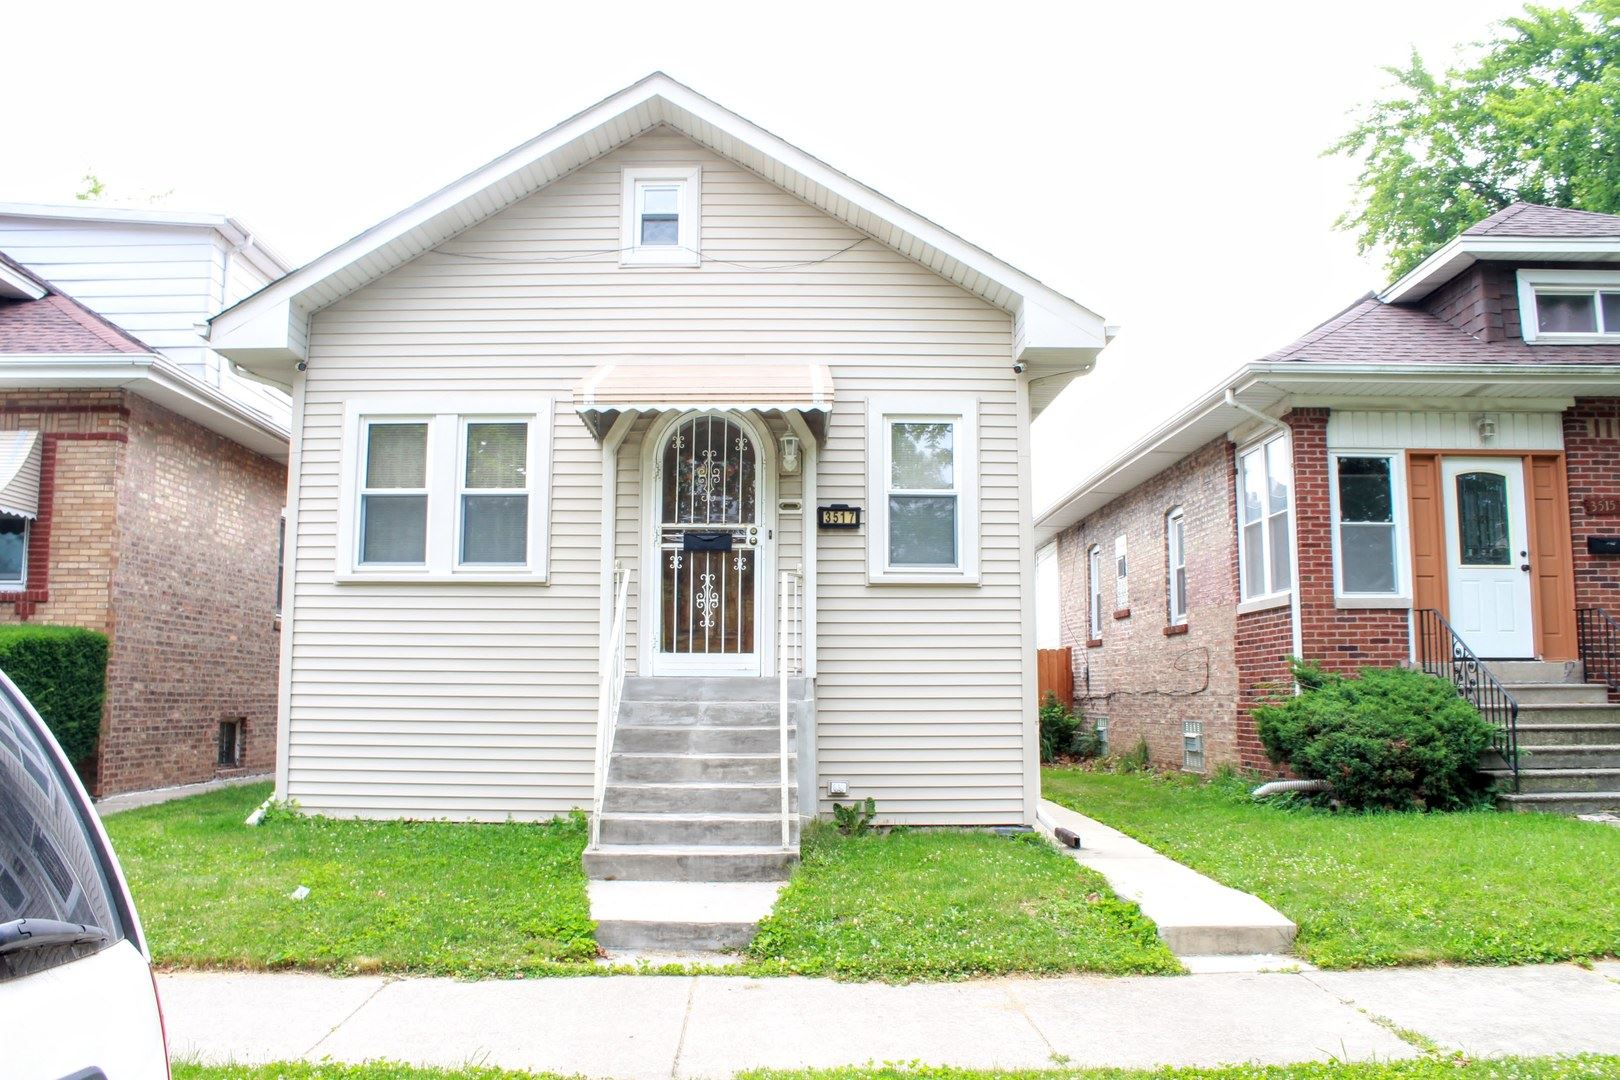 3517 N Osceola Avenue, Chicago, IL 60634 - #: 10775618